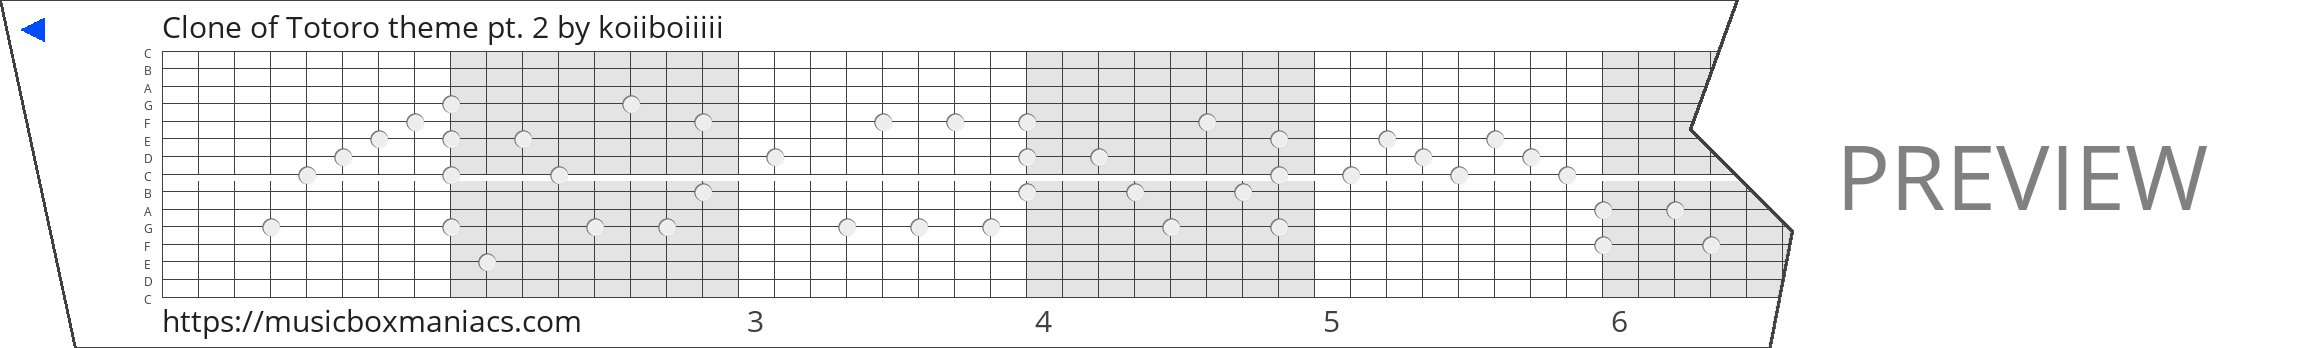 Clone of Totoro theme pt. 2 15 note music box paper strip